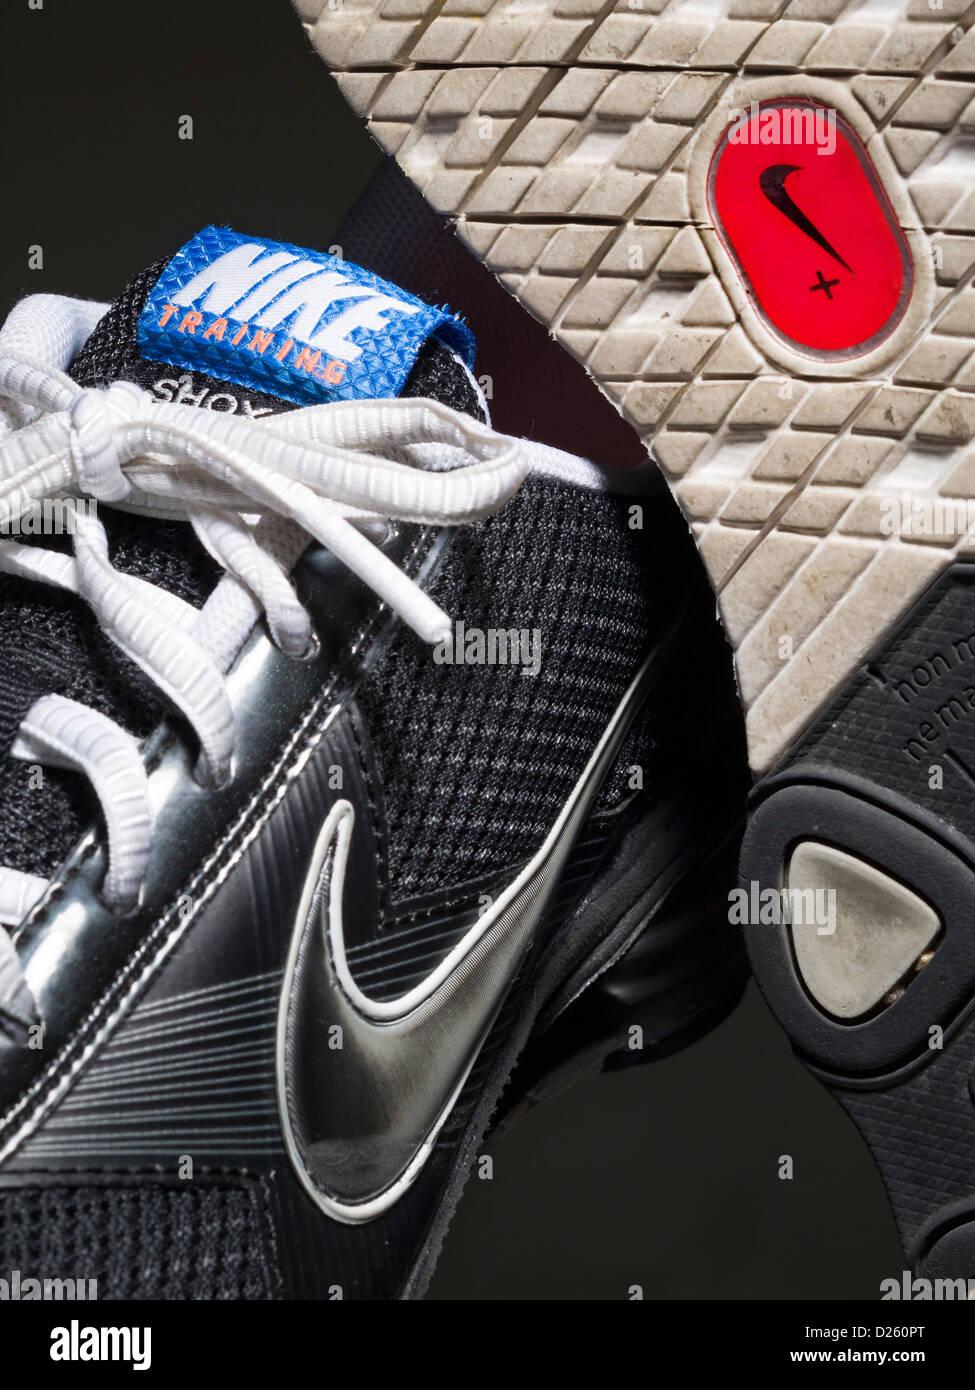 Nike Running Sneakers With Nike+ Sensor